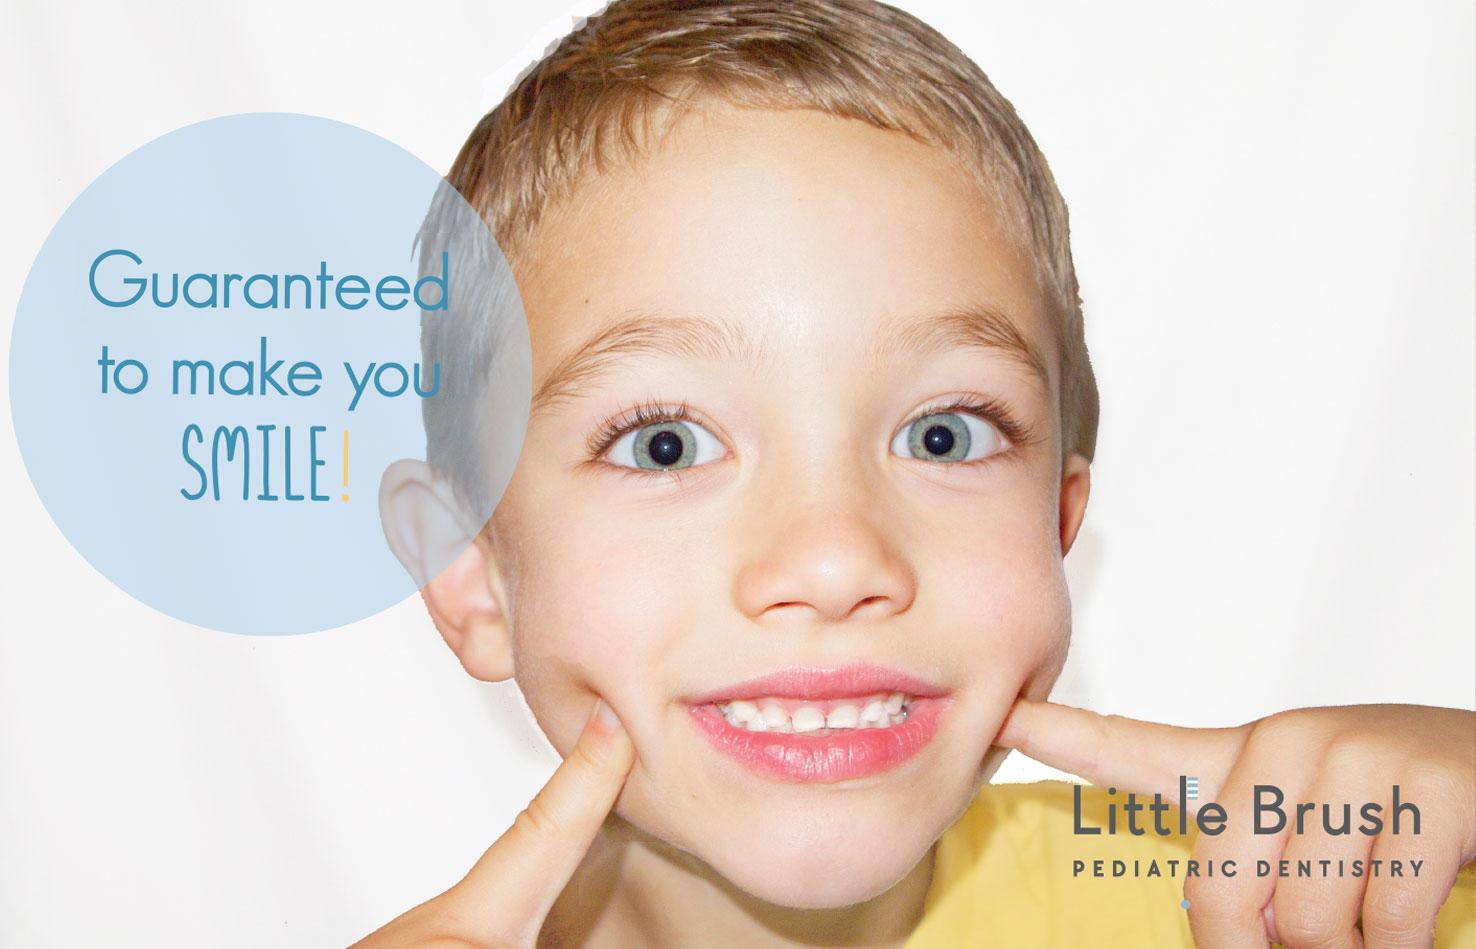 Little Brush Pediatric Dentistry collateral